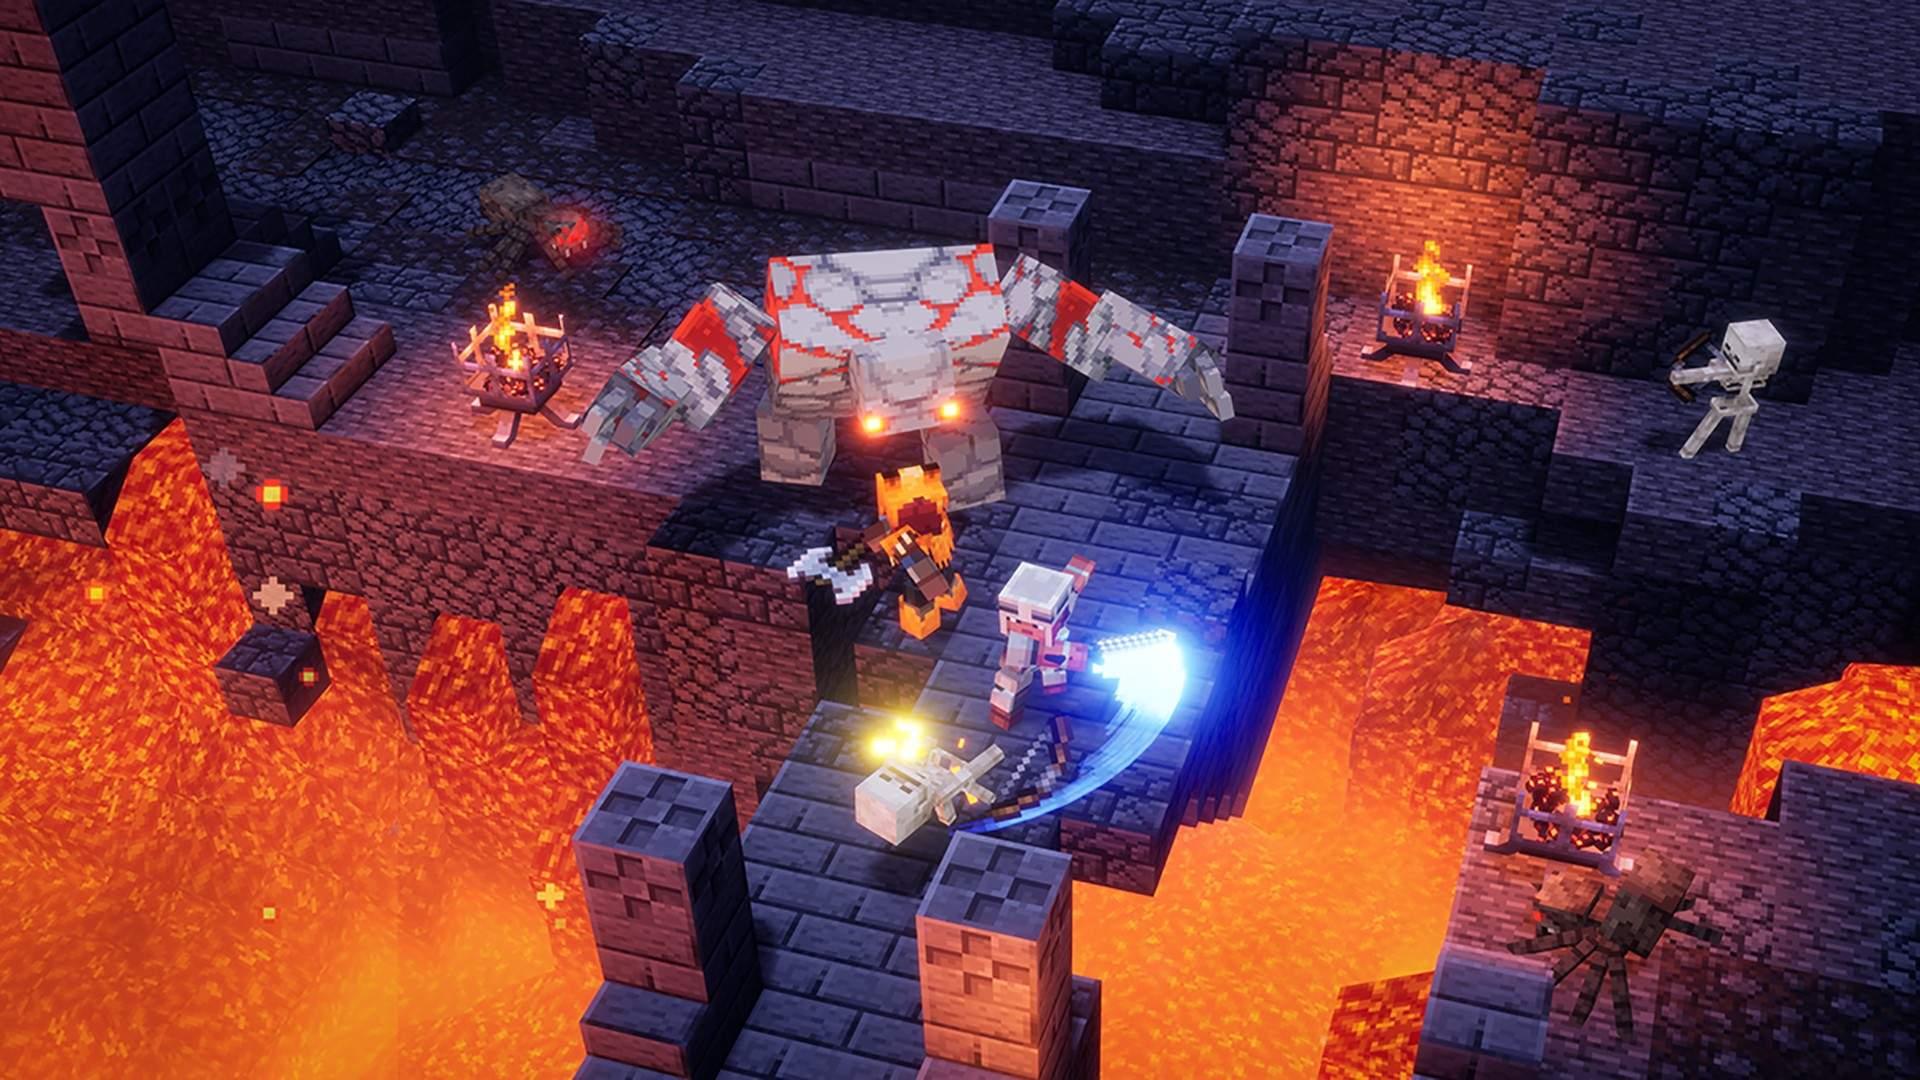 minecraft dungeons on windows store Dungeons-Launch_Action-Shot_JPG.jpg